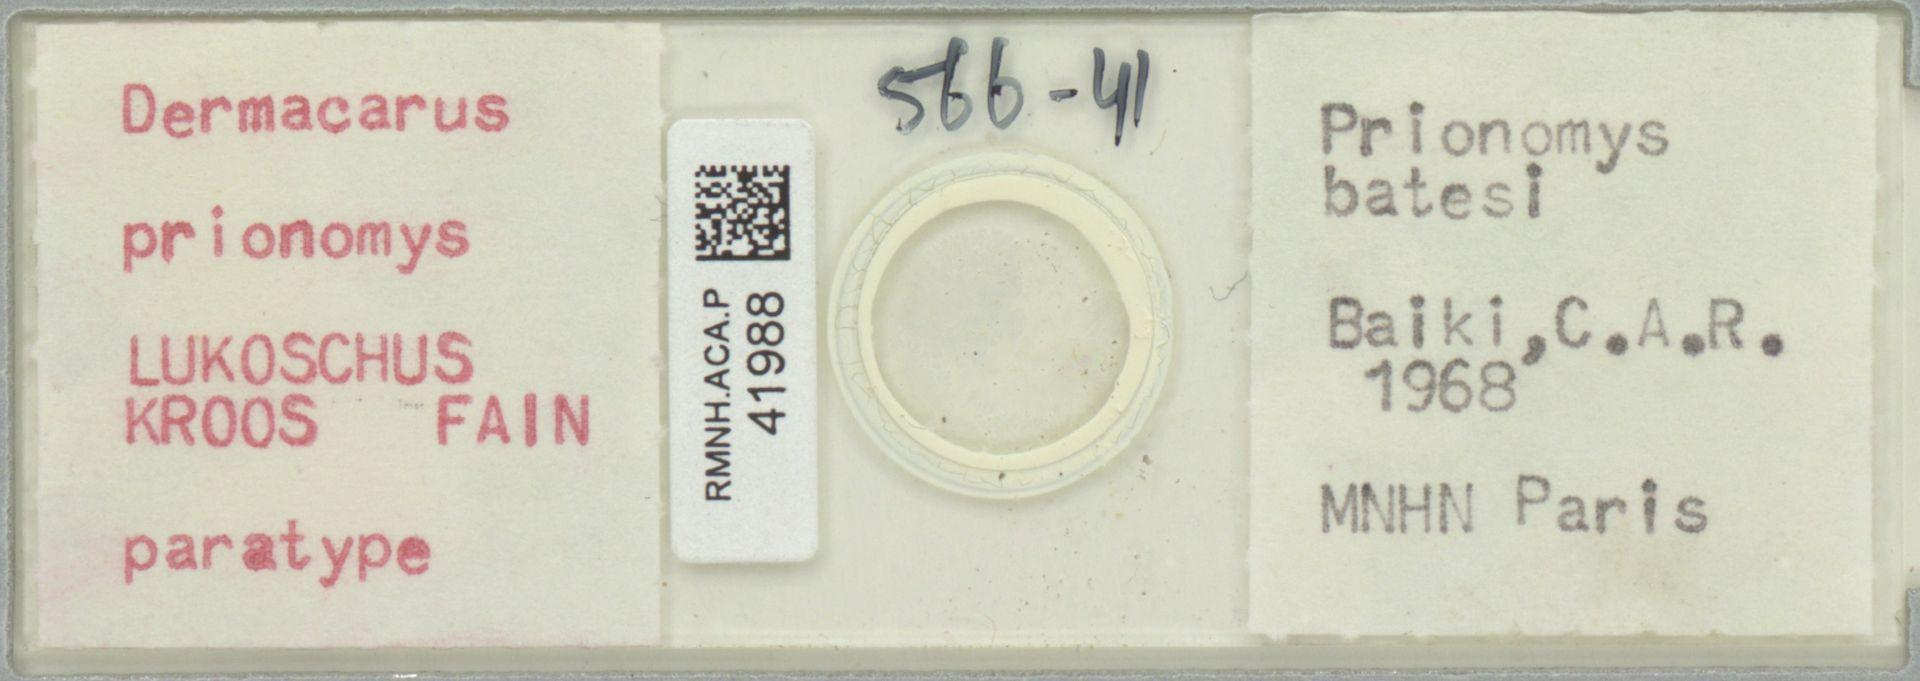 RMNH.ACA.P.41988 | Dermacarus prionomys Lukoschus, Kroos, Fain